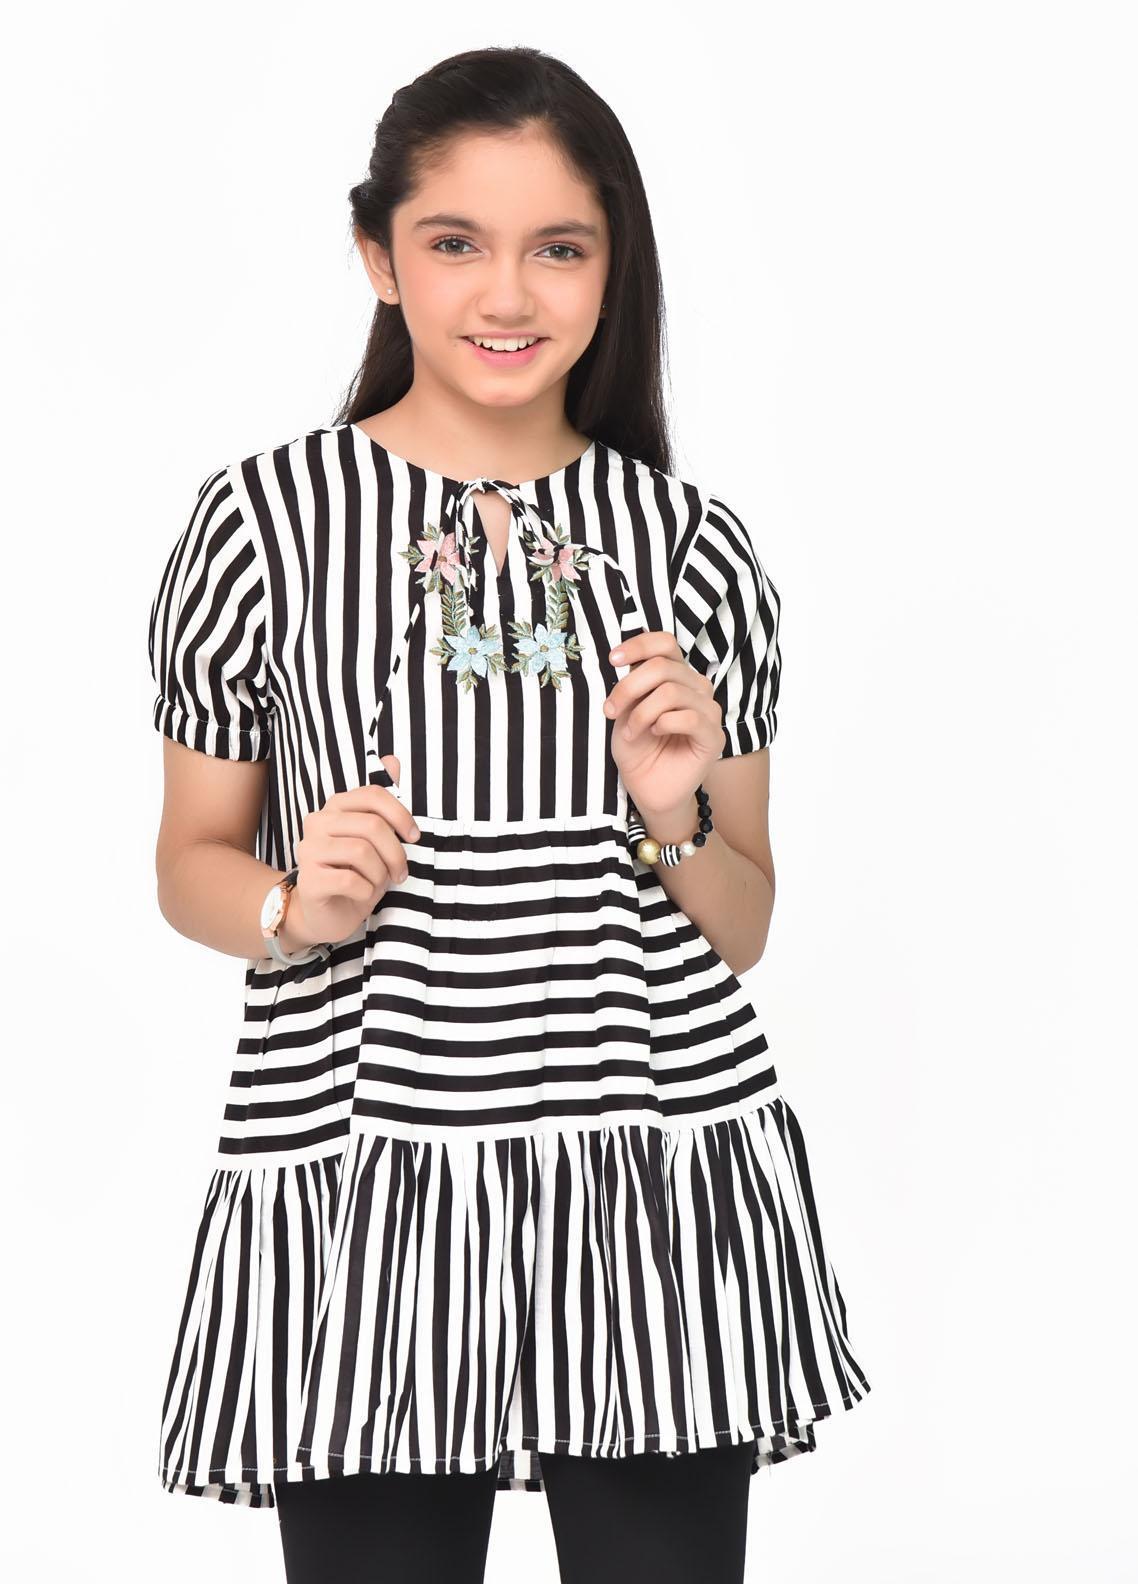 Ochre Linen Fancy Western Top for Girls -  OWT-432 Black & White